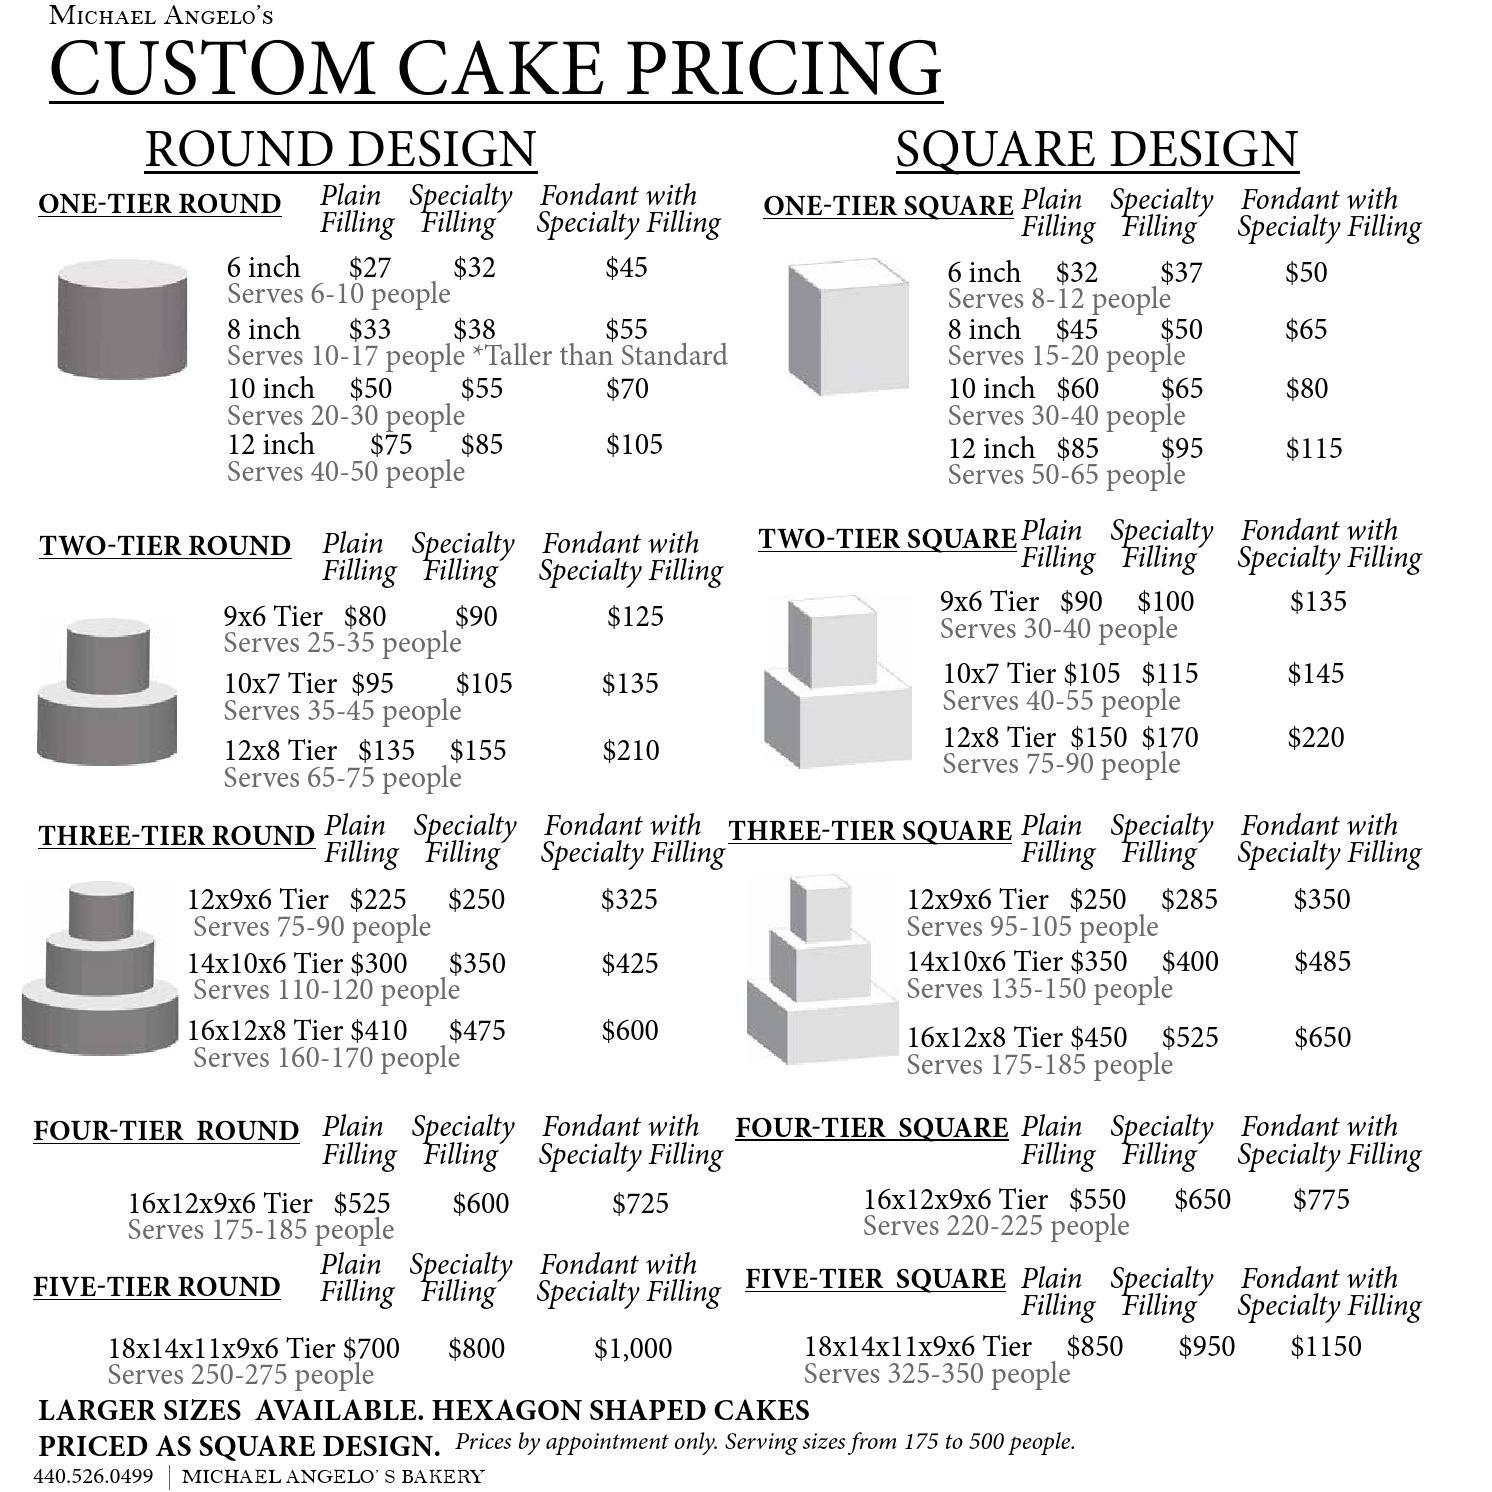 Pin by Rikkia Renee on Cakes Cakes & more Cakes   Pinterest   Custom ...